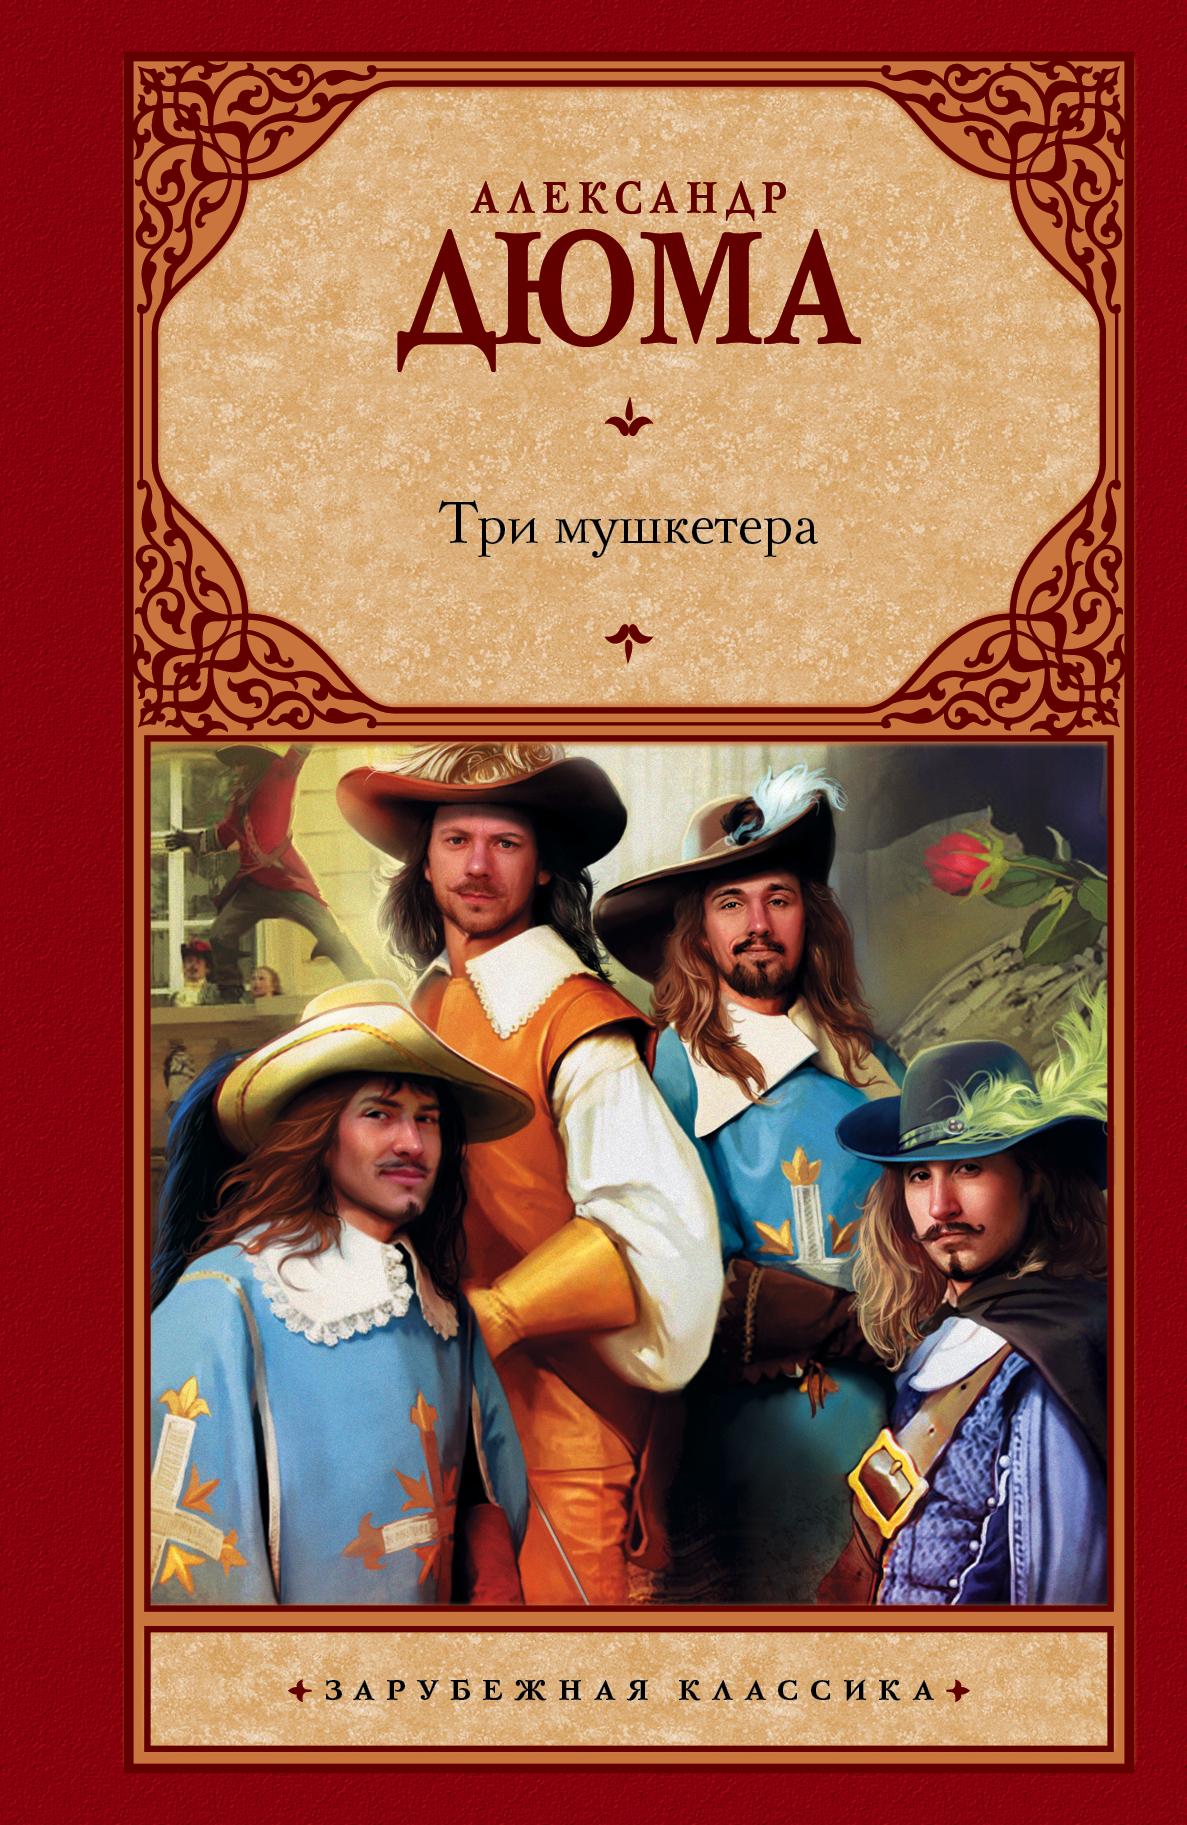 Сколько страниц в романе дюма три мушкетера 5 фотография